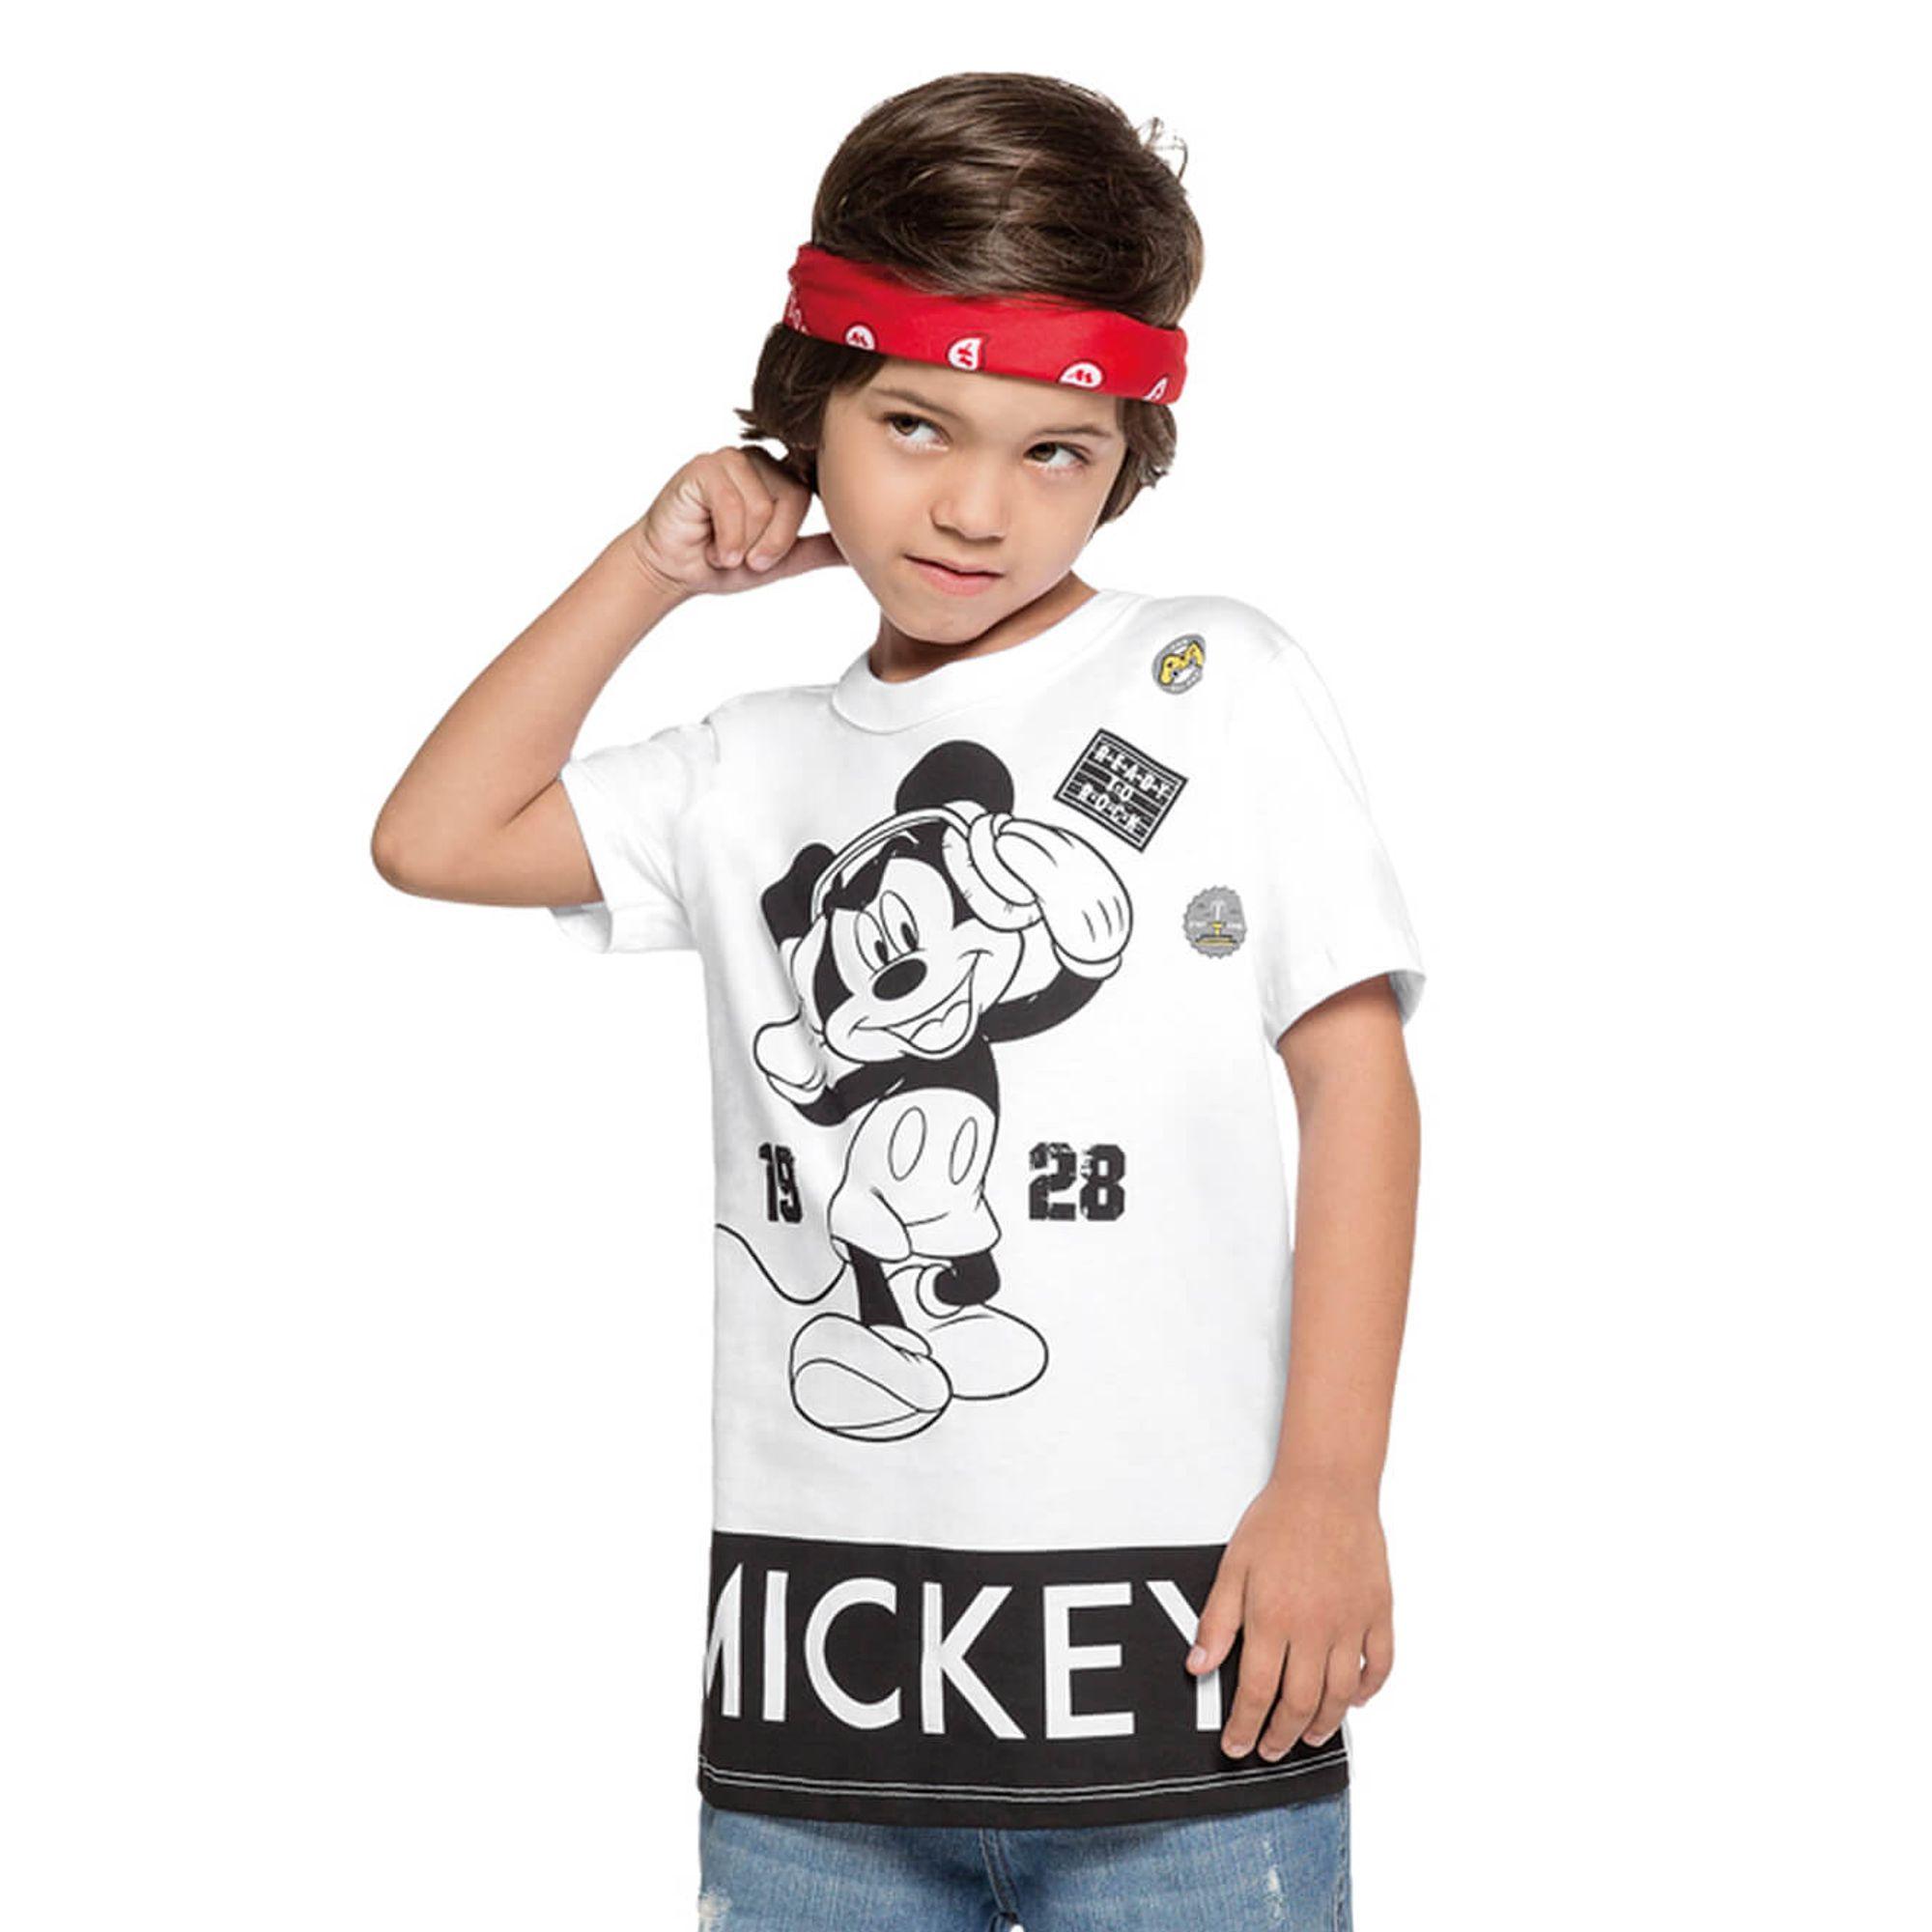 8055b05d92 Camiseta Infantil Mickey Disney Branca e Preta - Cativa - EcaMeleca